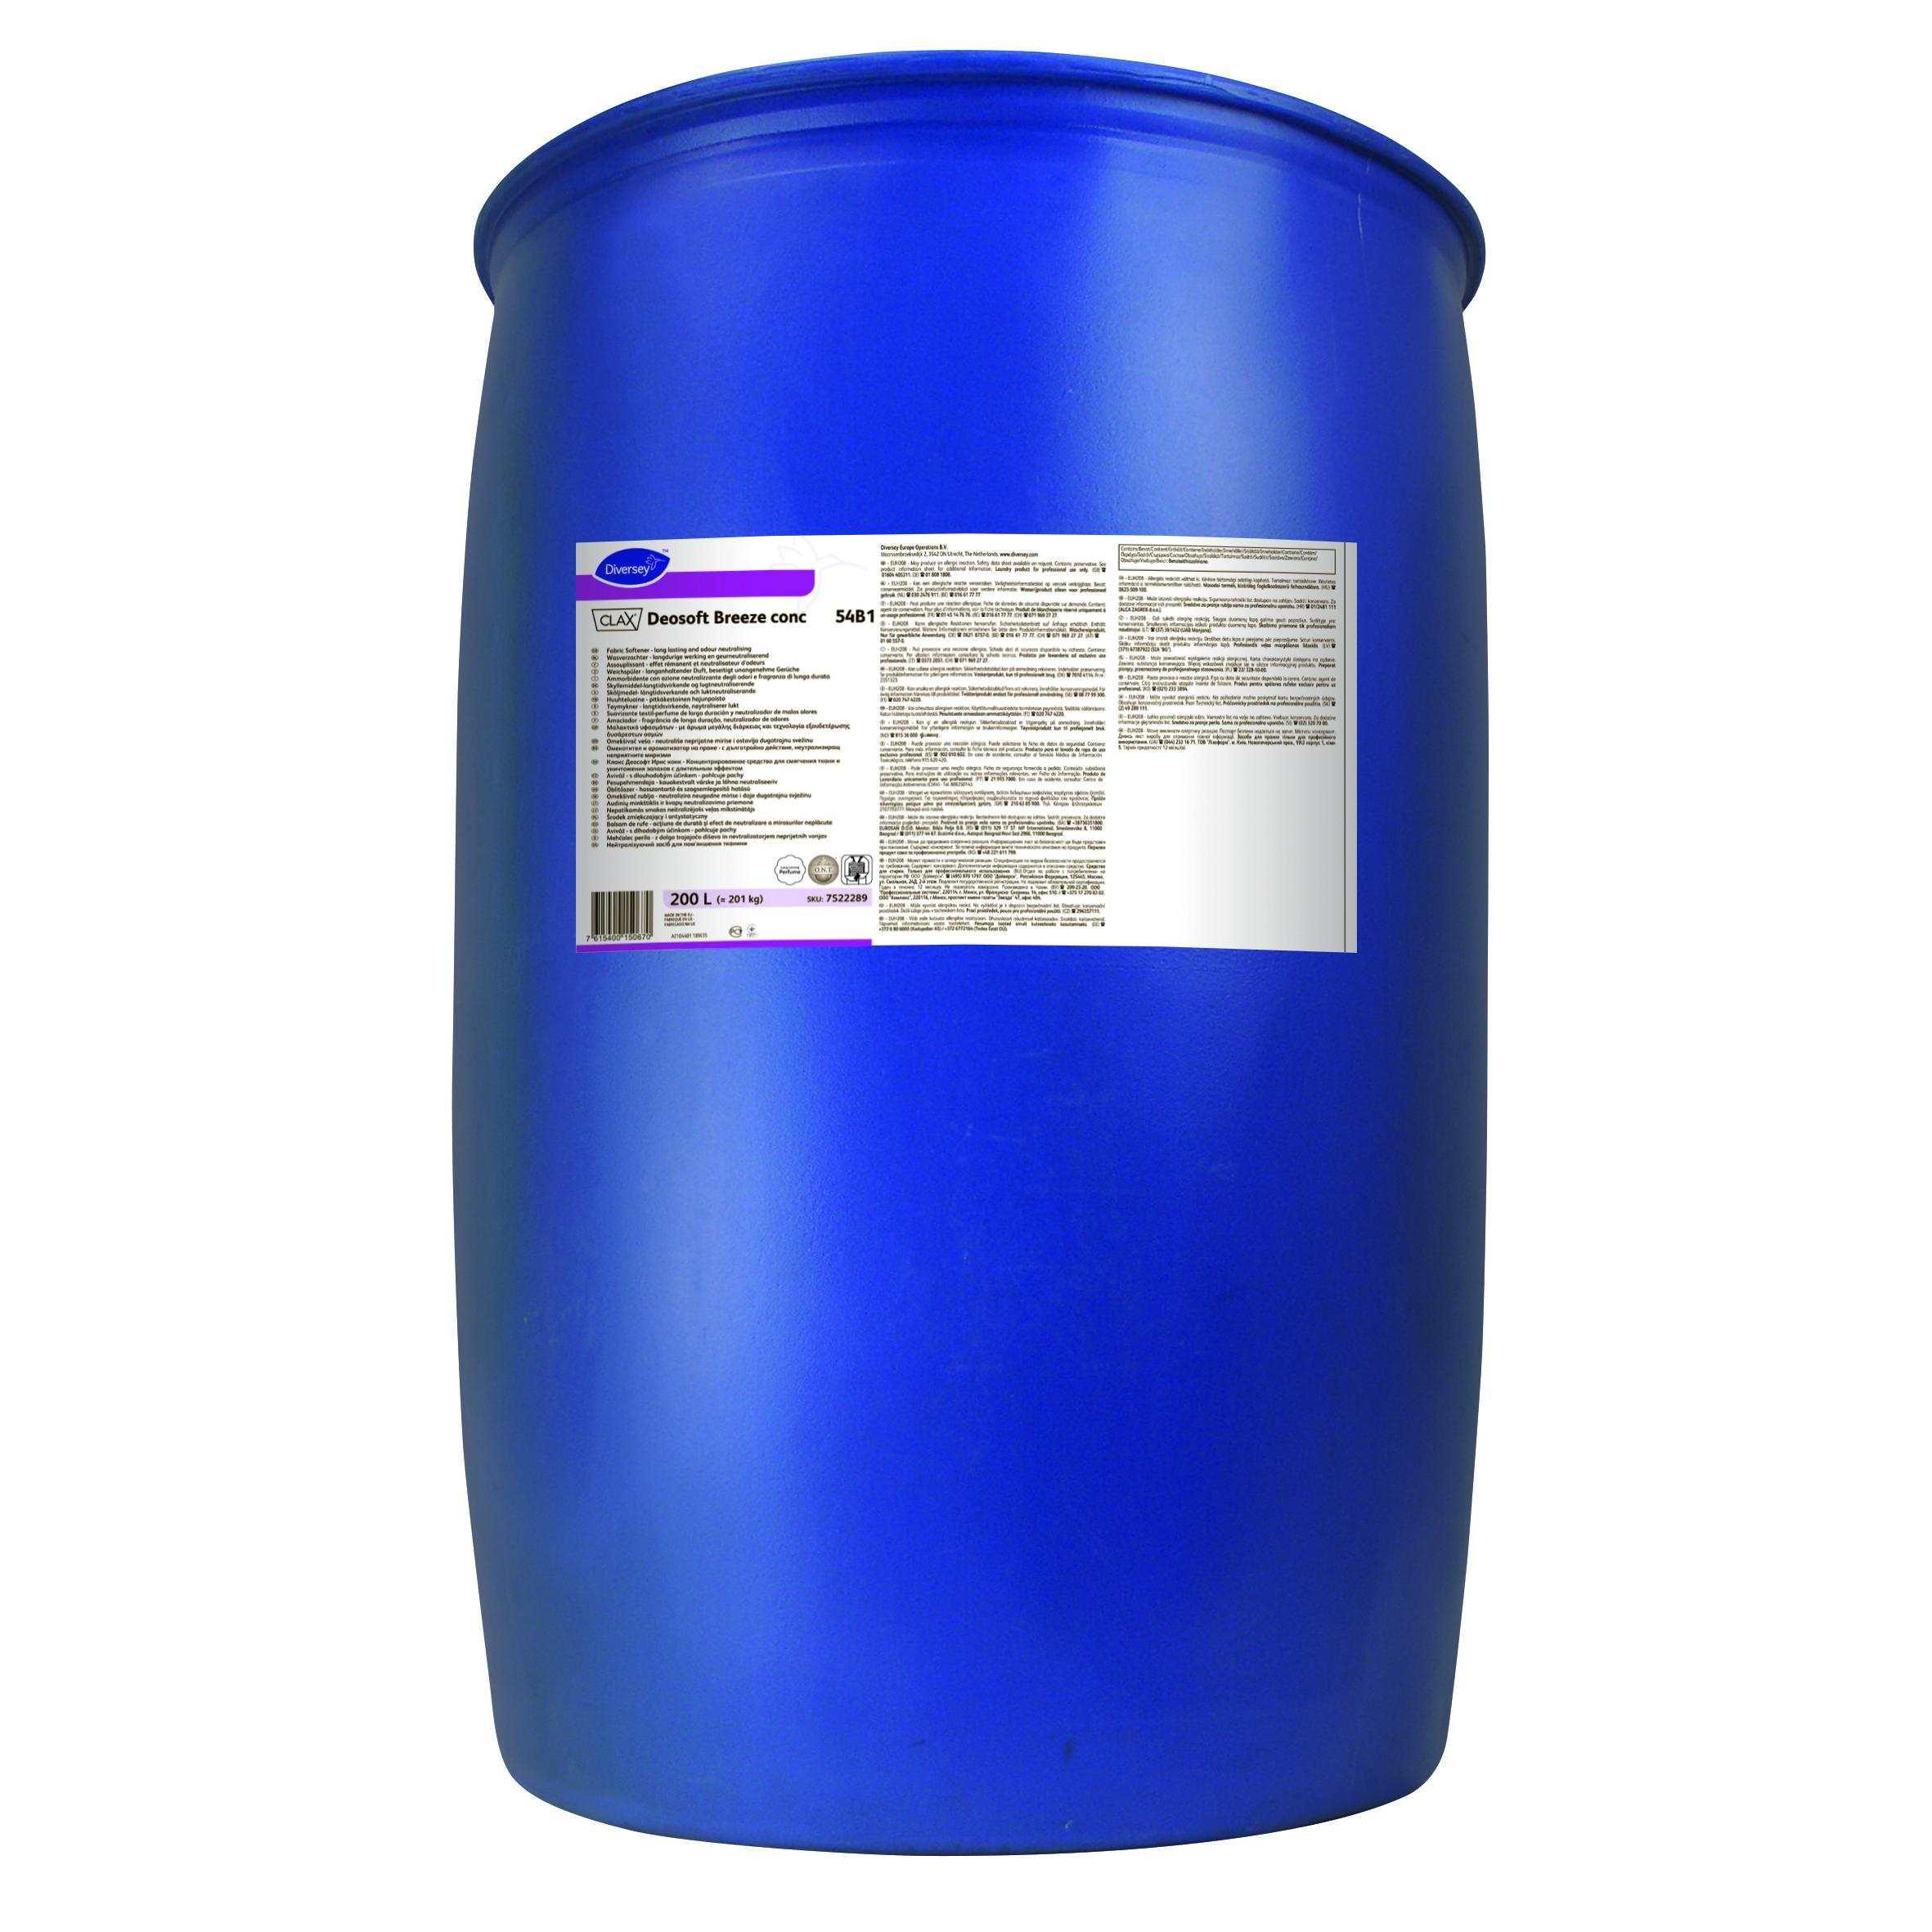 7522289-Clax-Deosoft-Breeze-conc-54B1-200l-CYMK-20x20cm.jpg